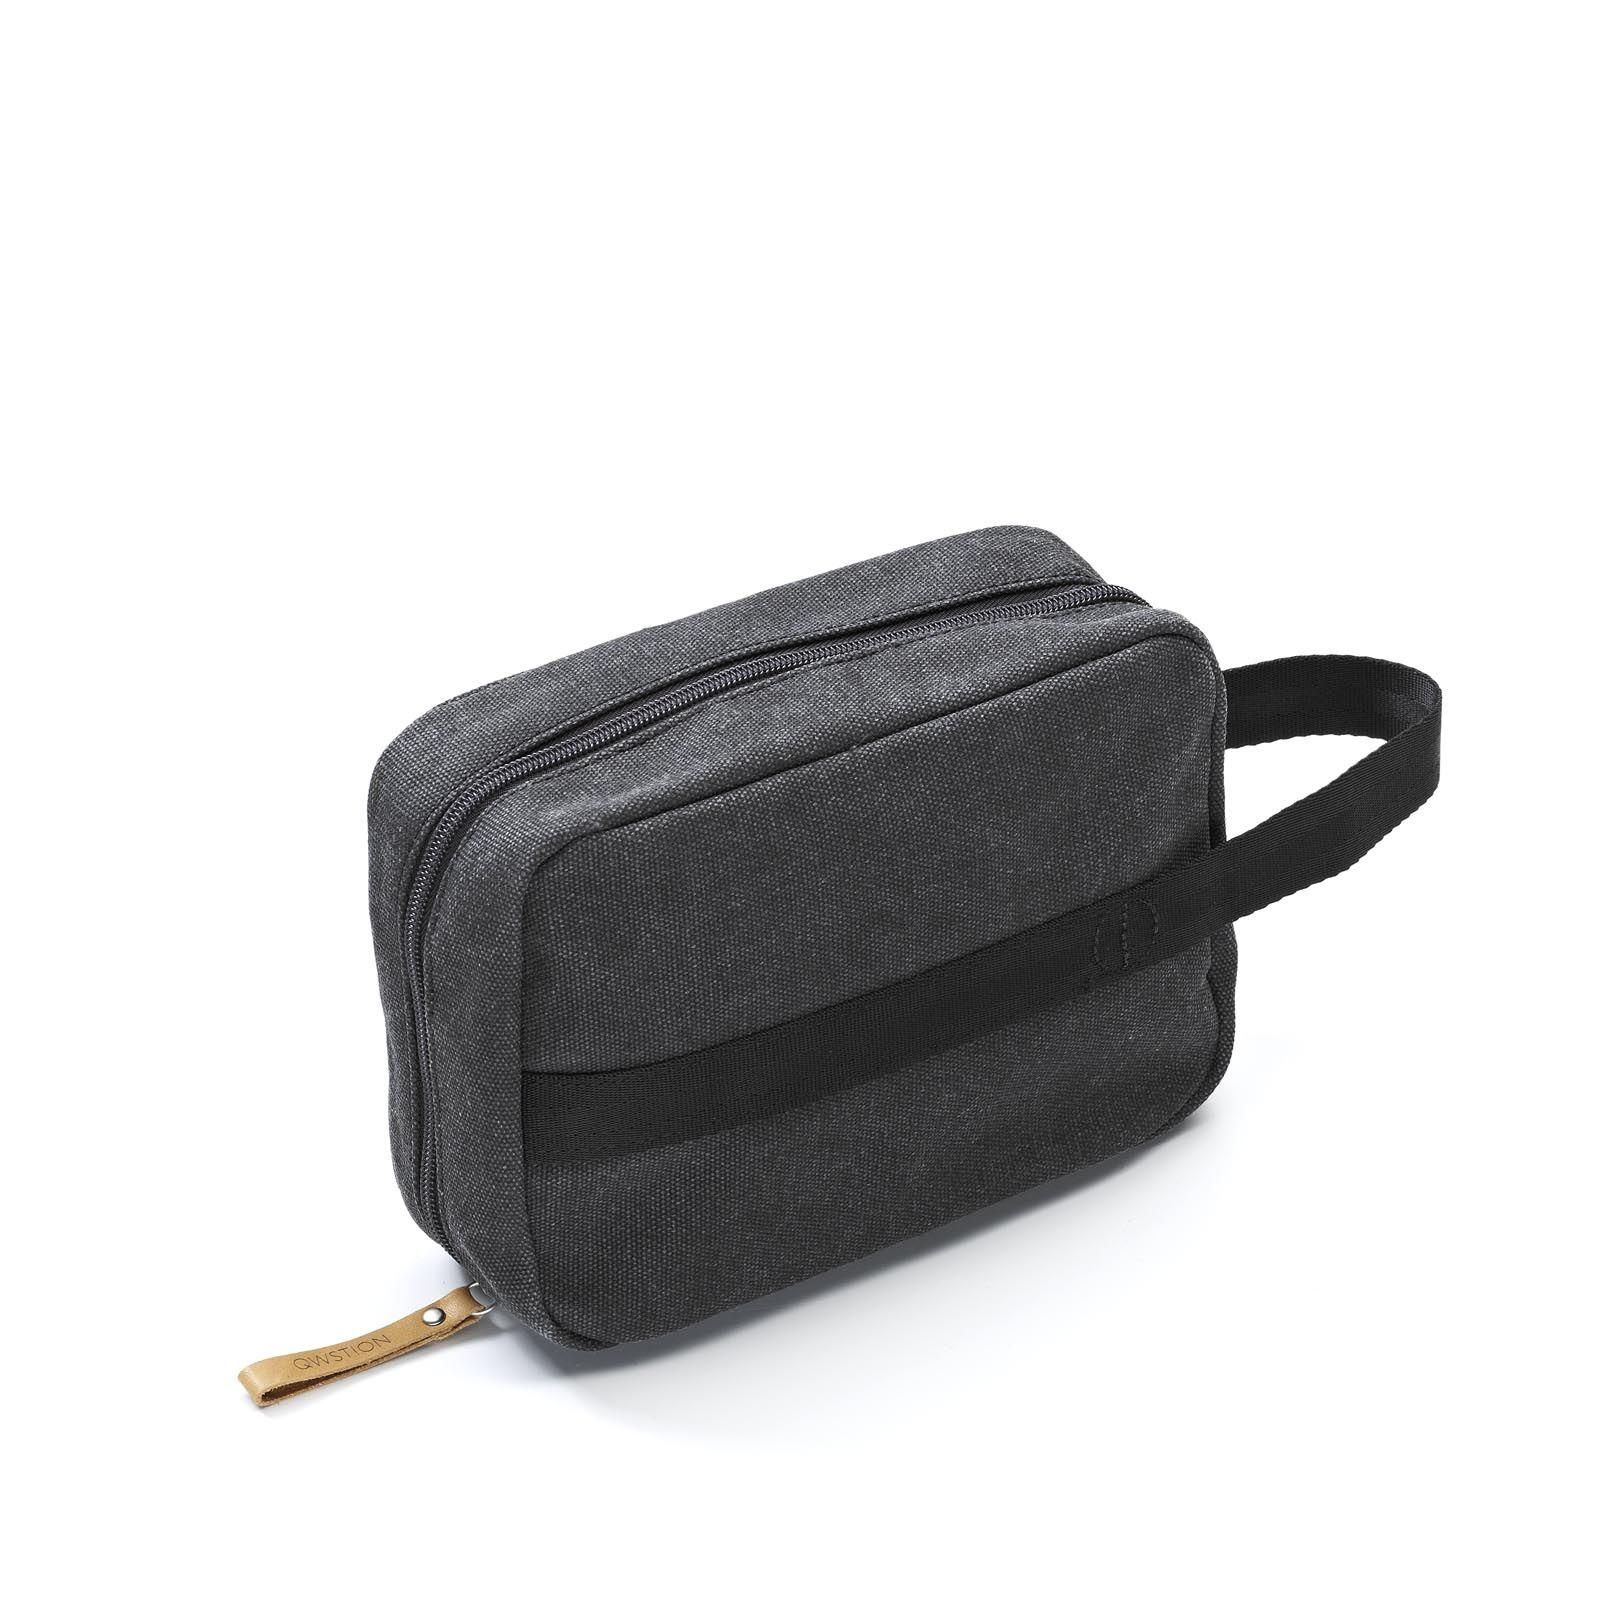 Toiletry Kit - Washed Black